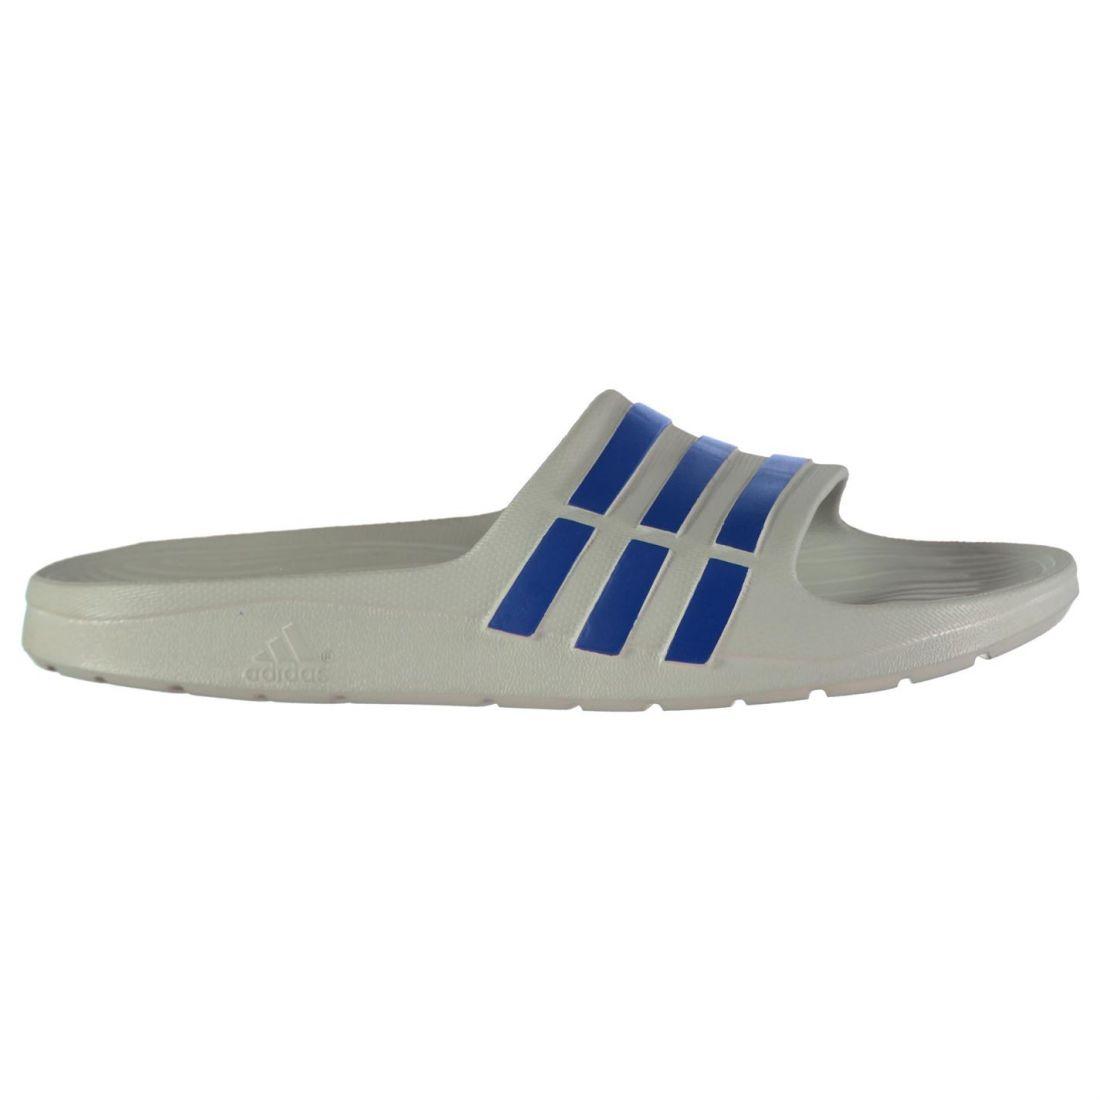 8b3174498f7aa adidas Kids Duramo Junior Sliders Pool Shoes Flip Flops Beach Sandals